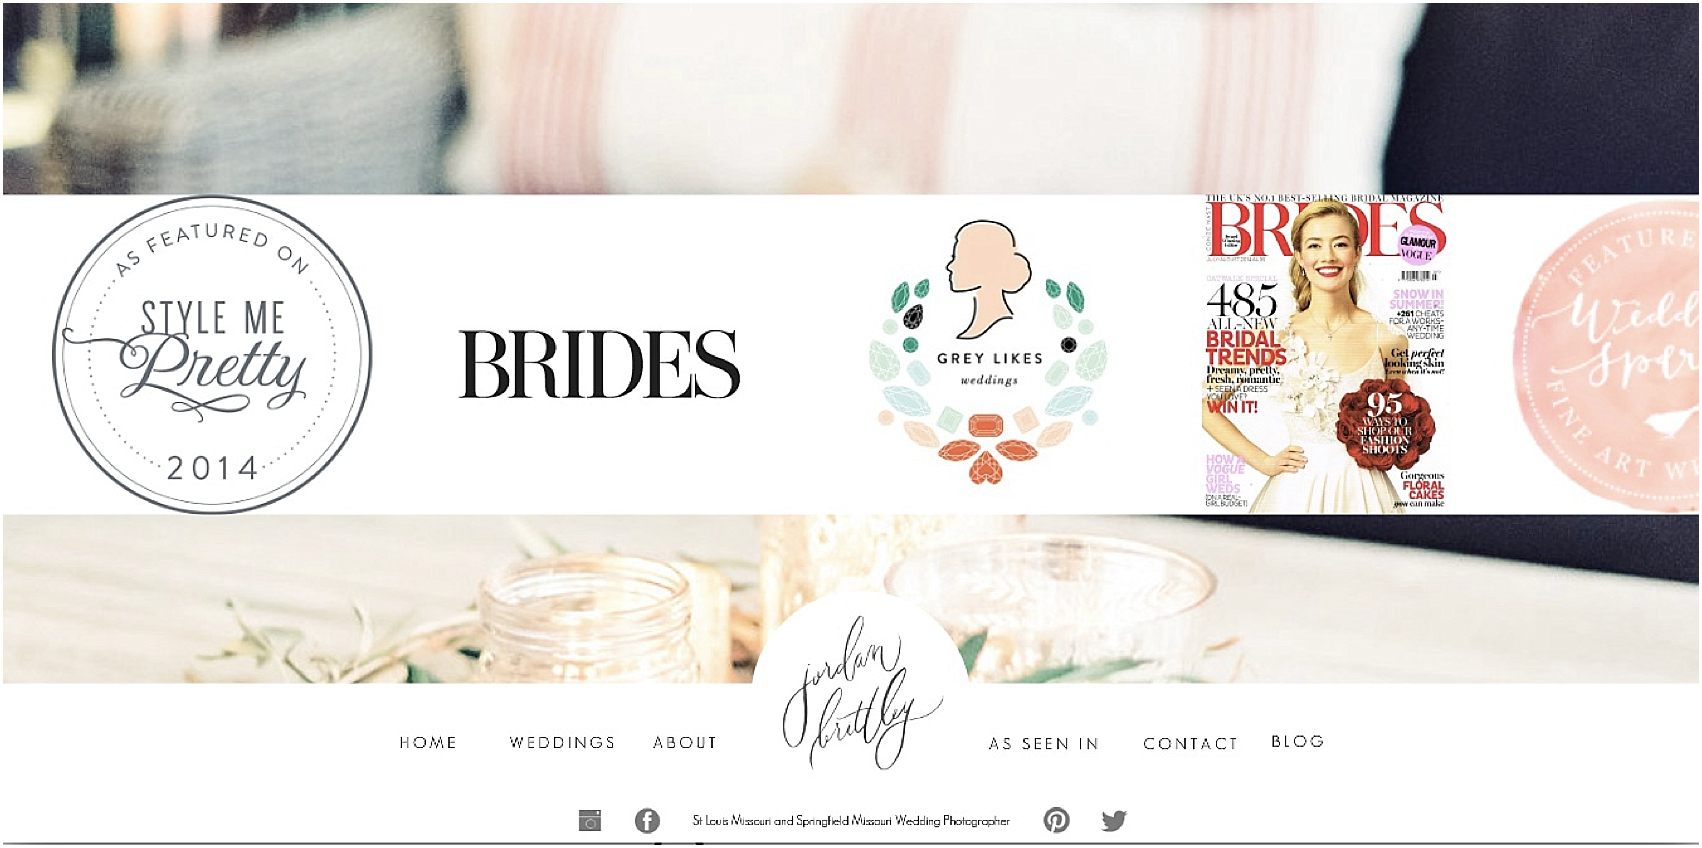 How to Give Your Website a Quick Update - The Jordan Brittley Blog (www.jordanbrittleyblog.com)